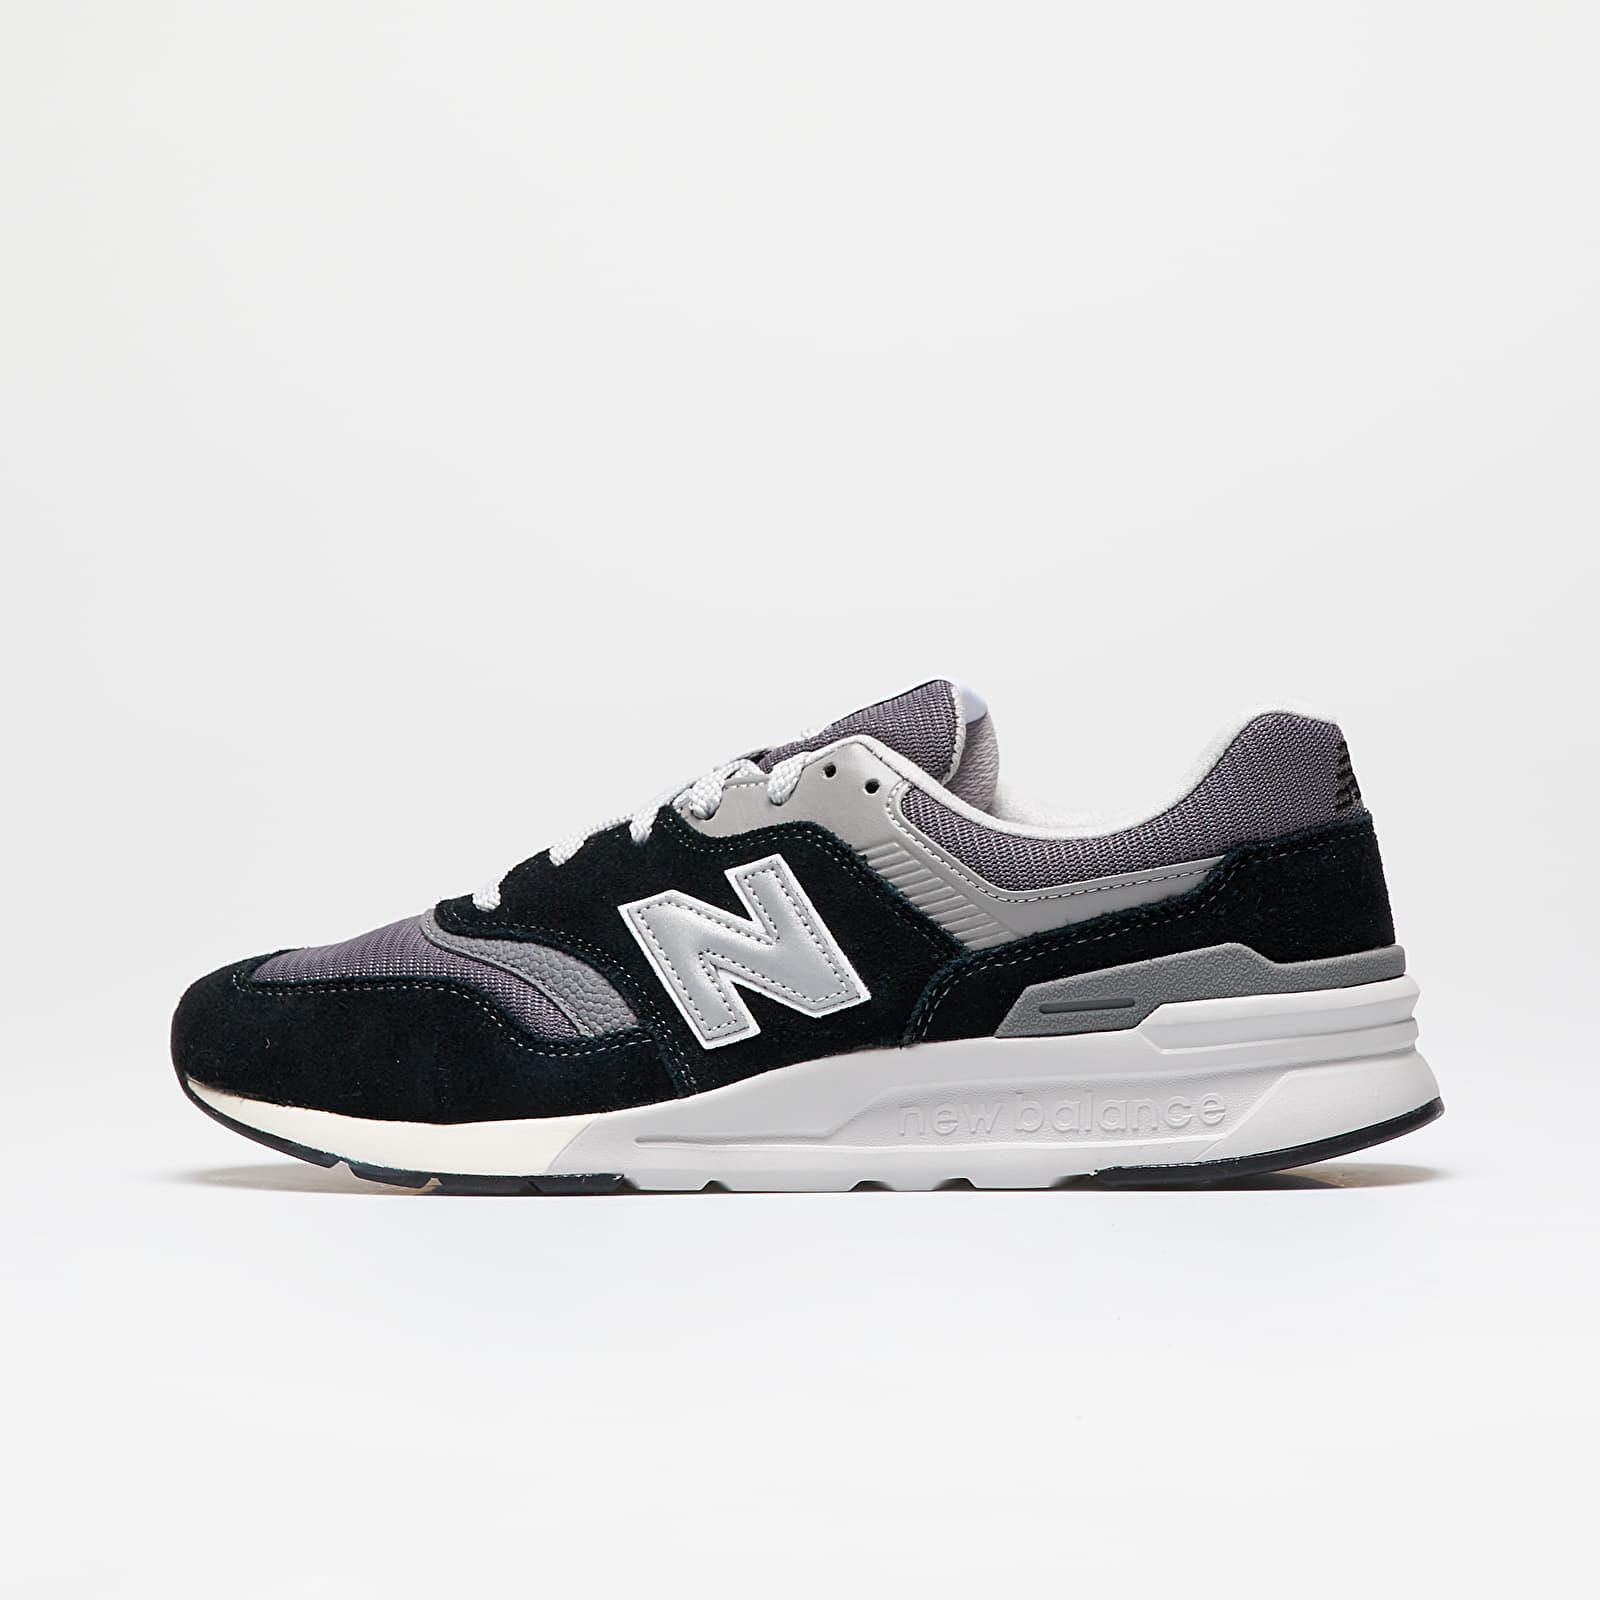 Muške tenisice New Balance 997 Black/ Gray